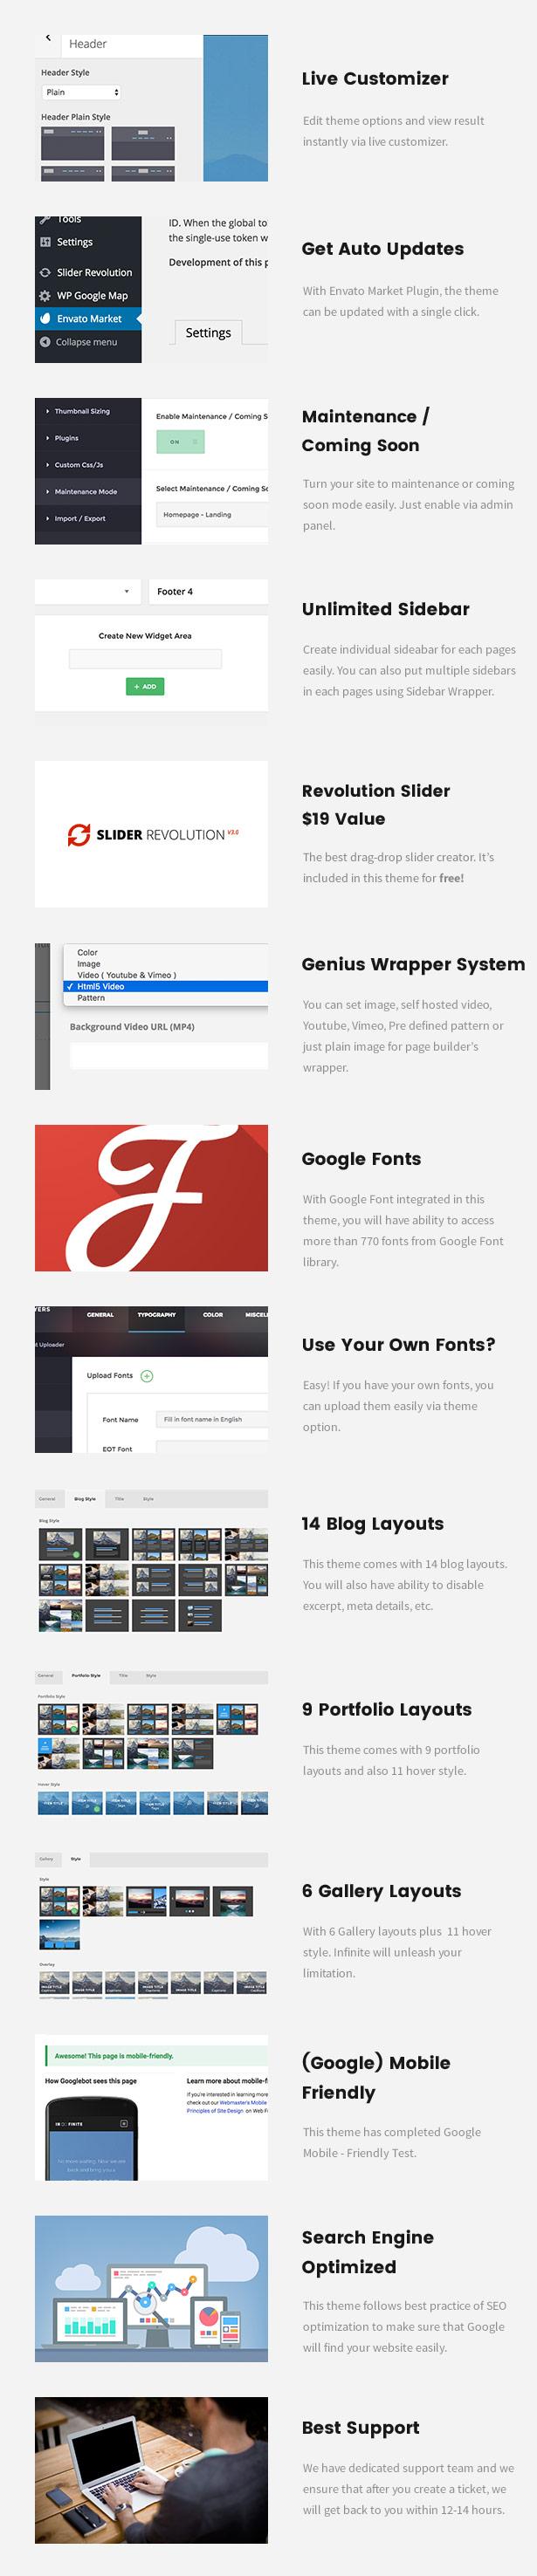 screen 11 - SEOCrawler - SEO & Marketing Agency WordPress